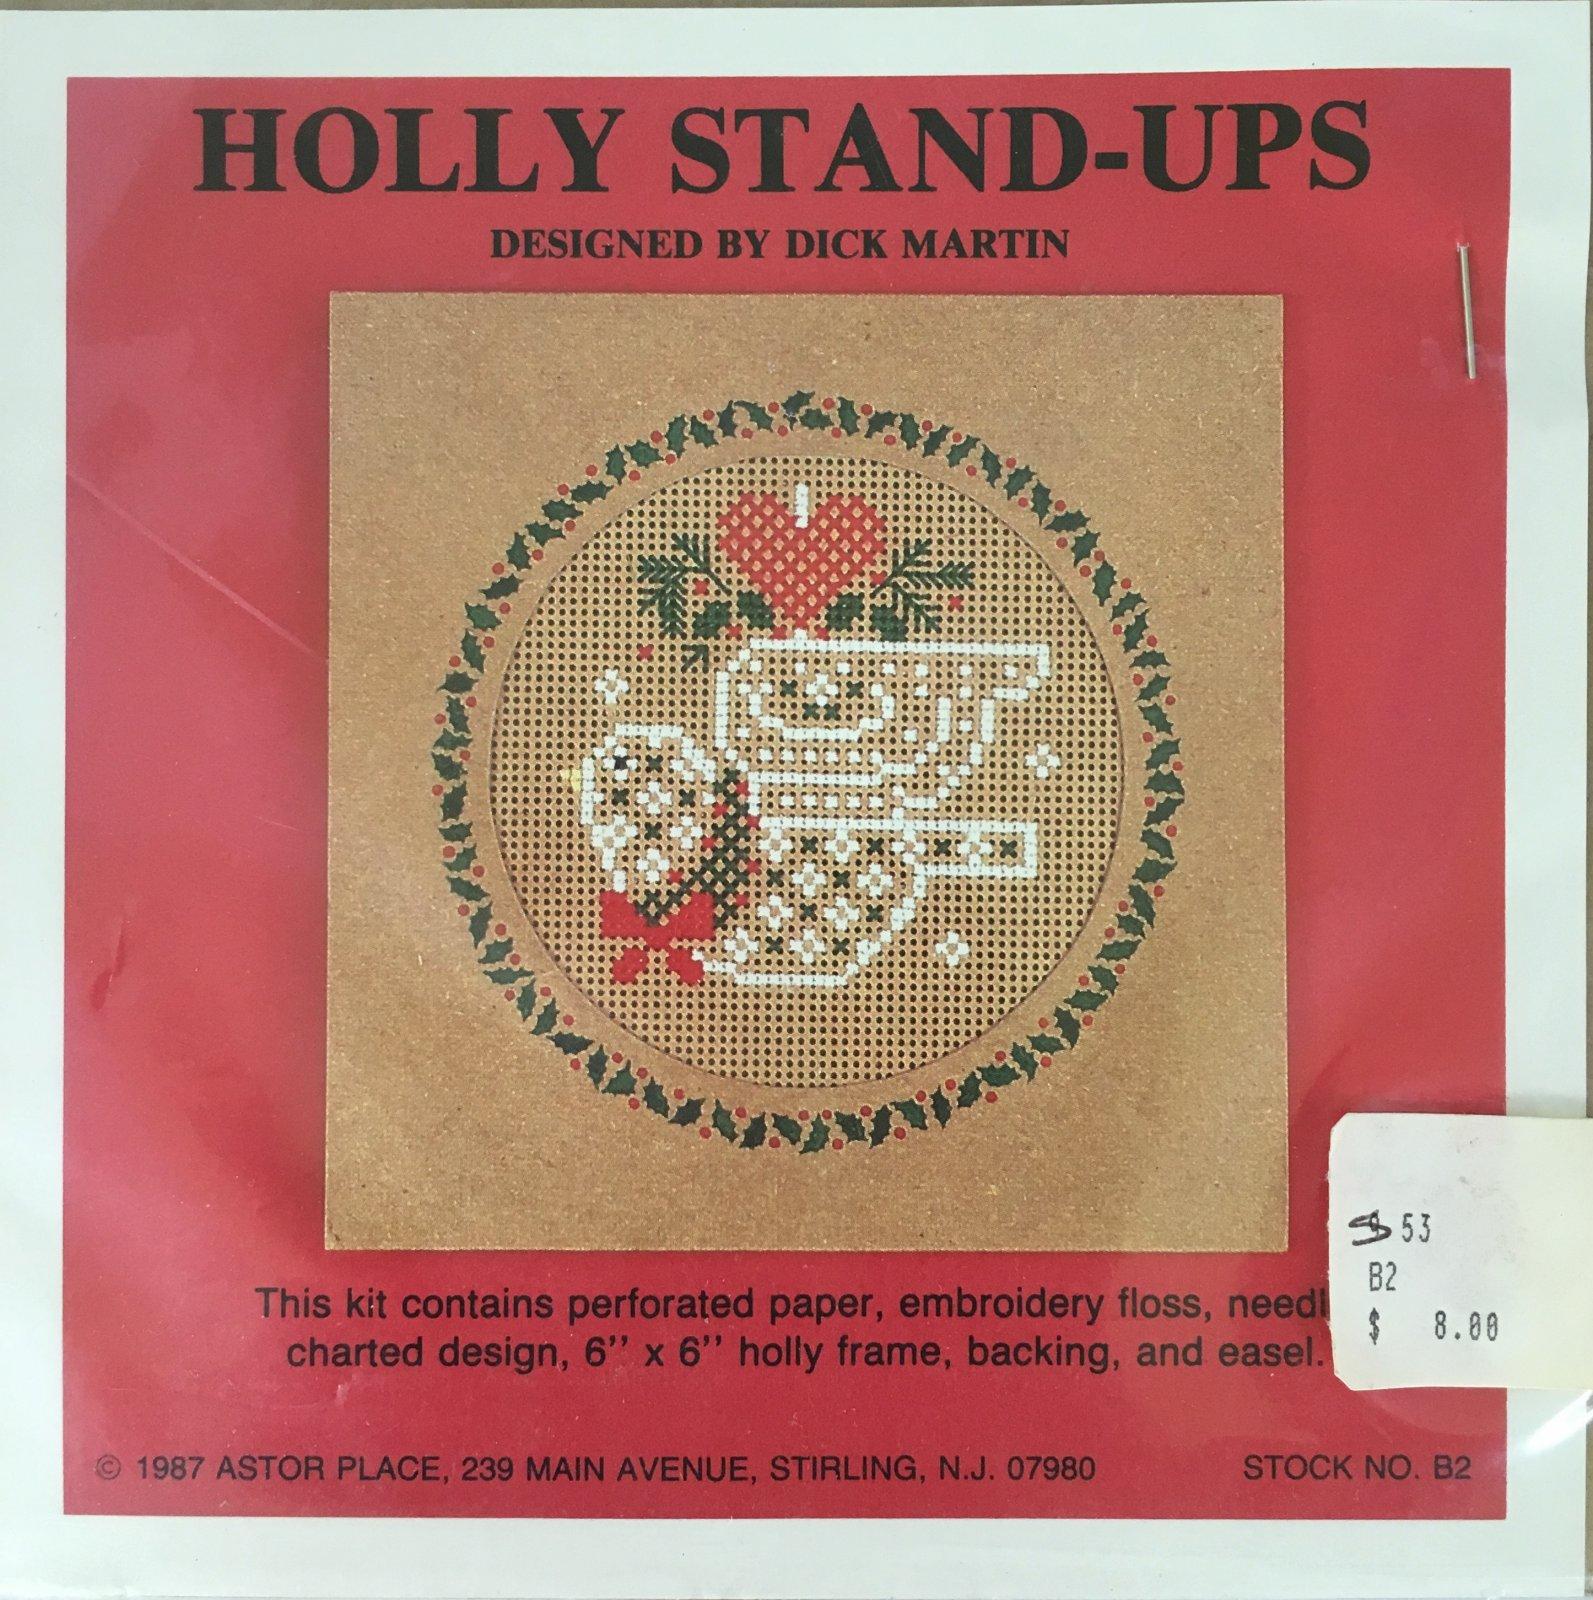 Astor Place: Holly Stand-Ups Bird Kit B2